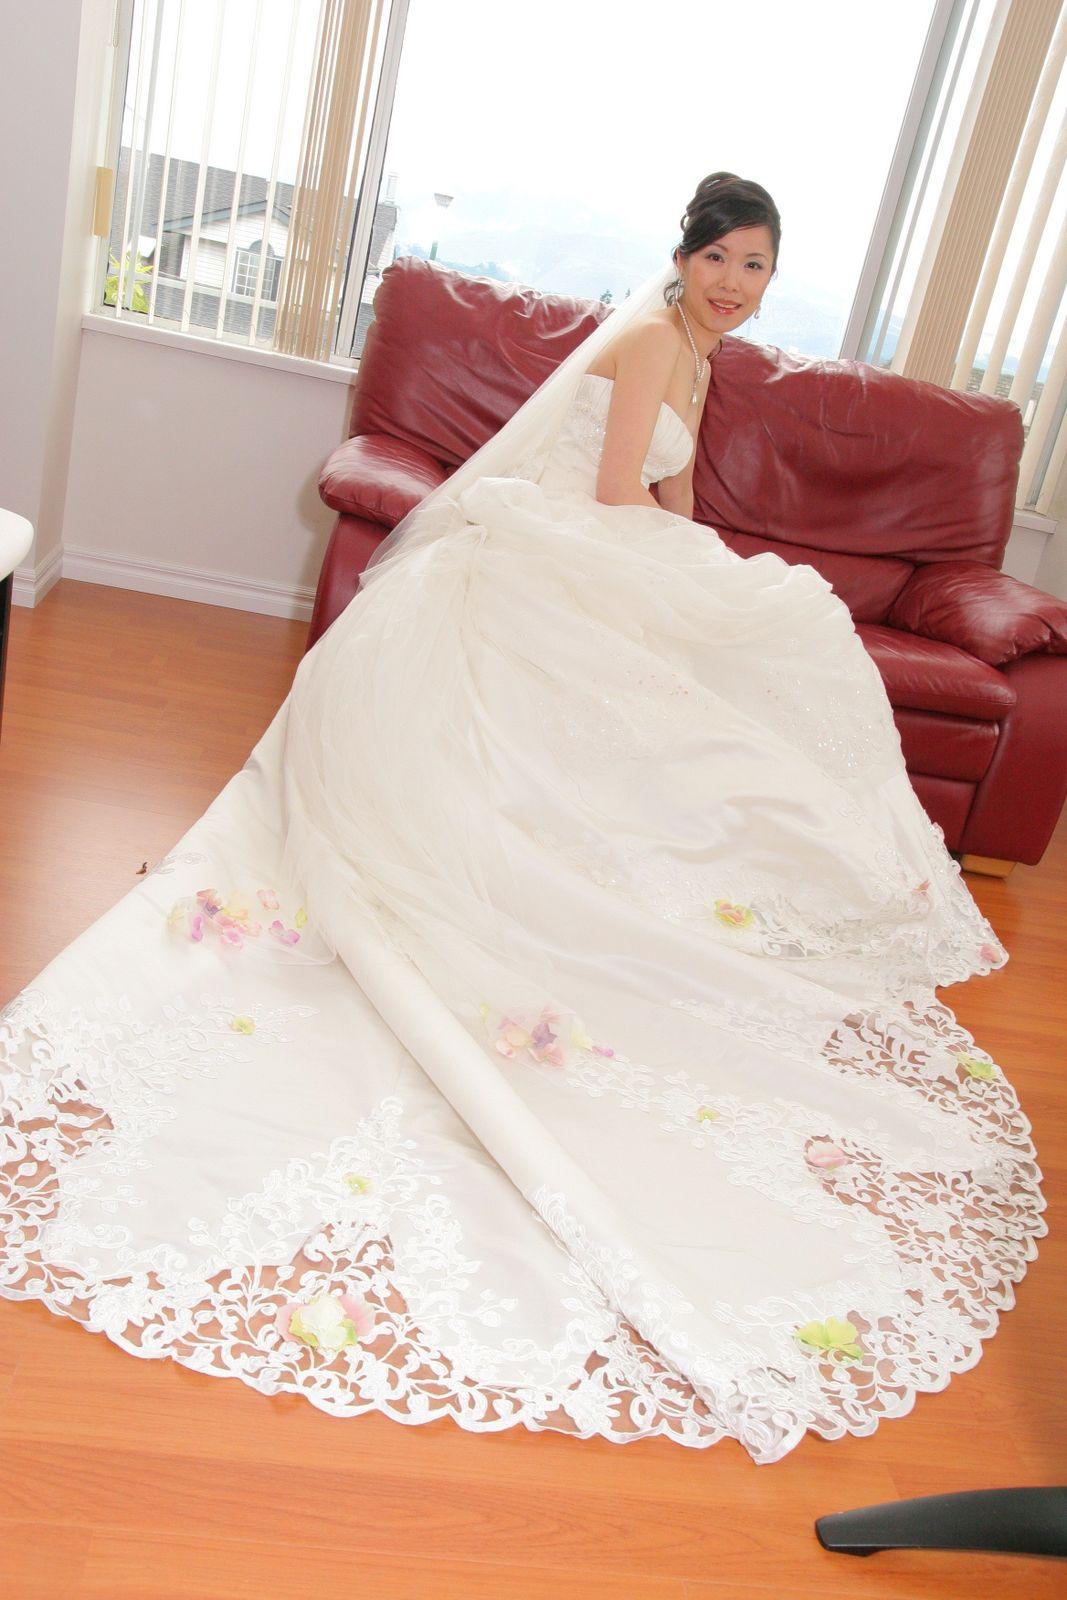 reddish background and white wedding dress.